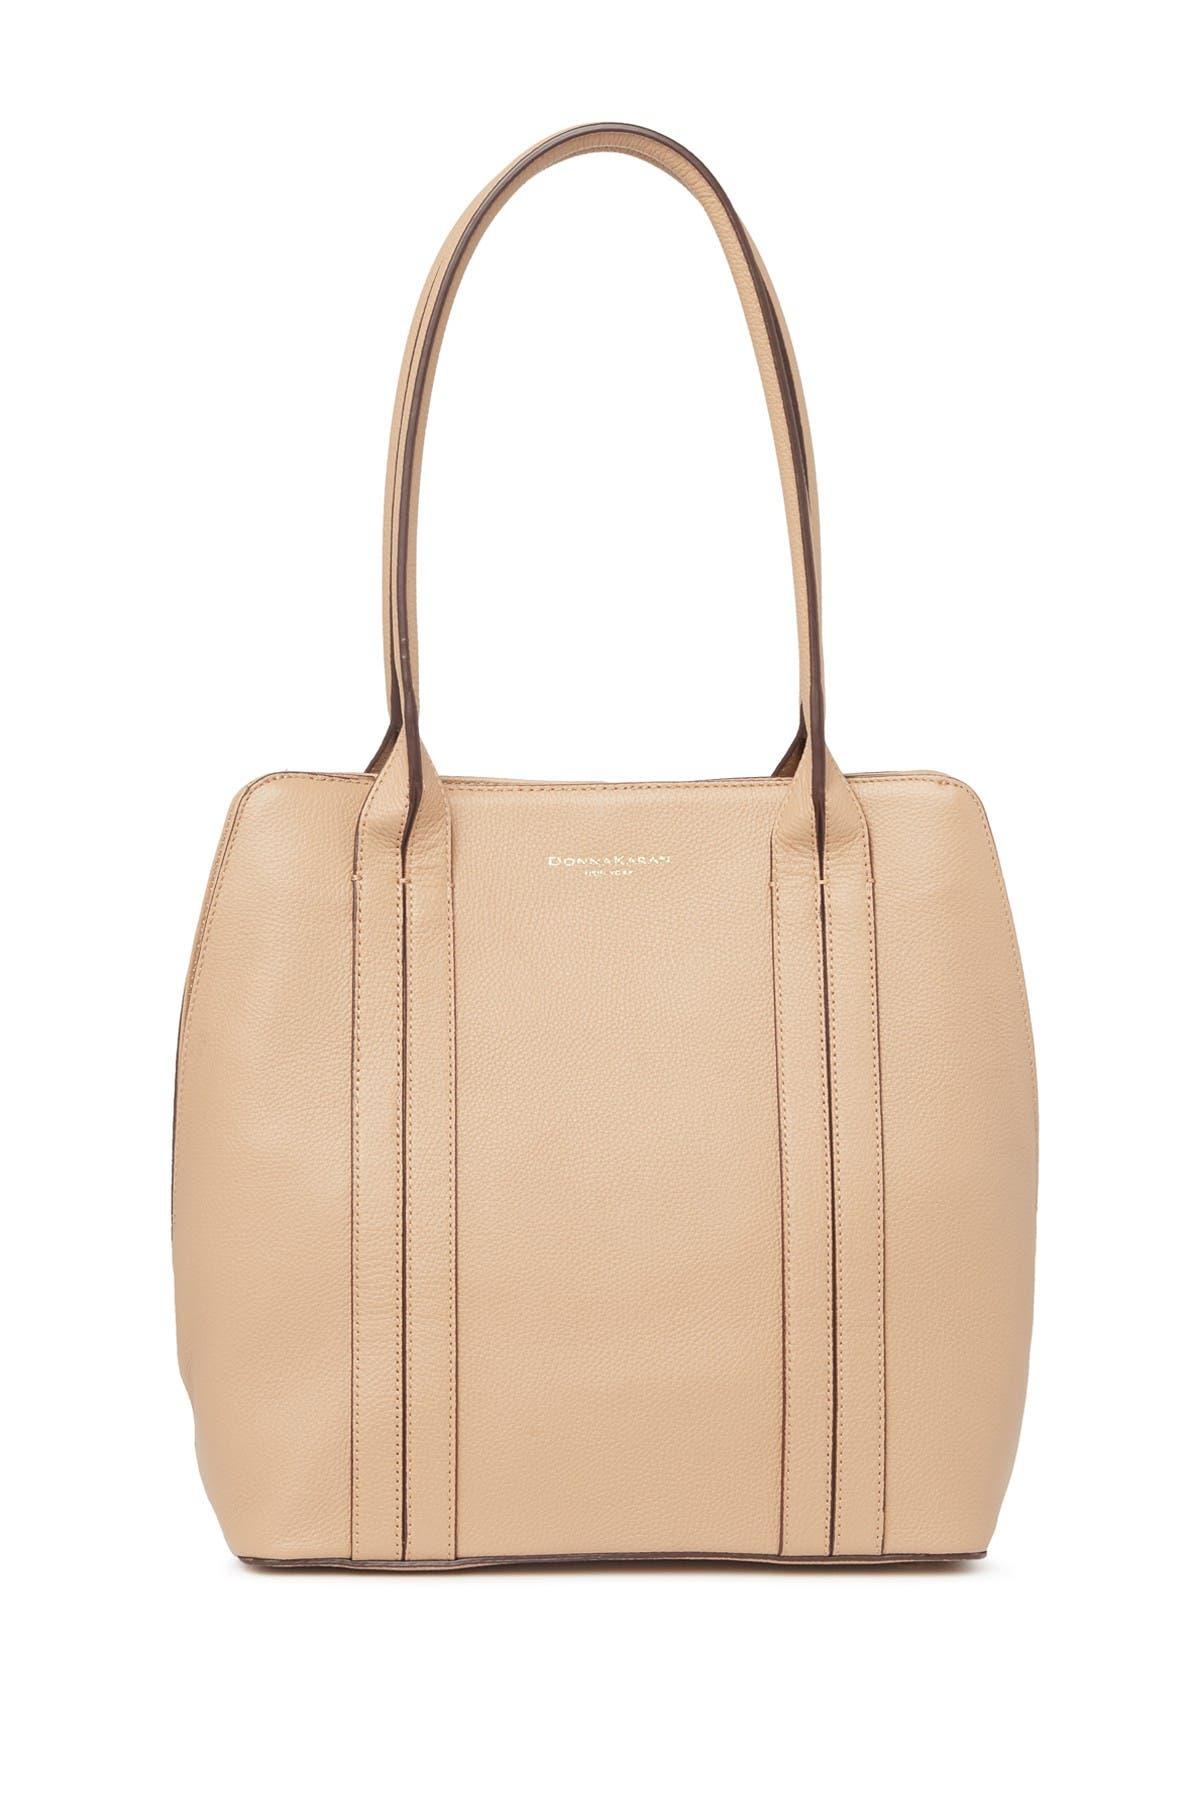 Image of Donna Karan Perry North/South Leather Shoulder Bag